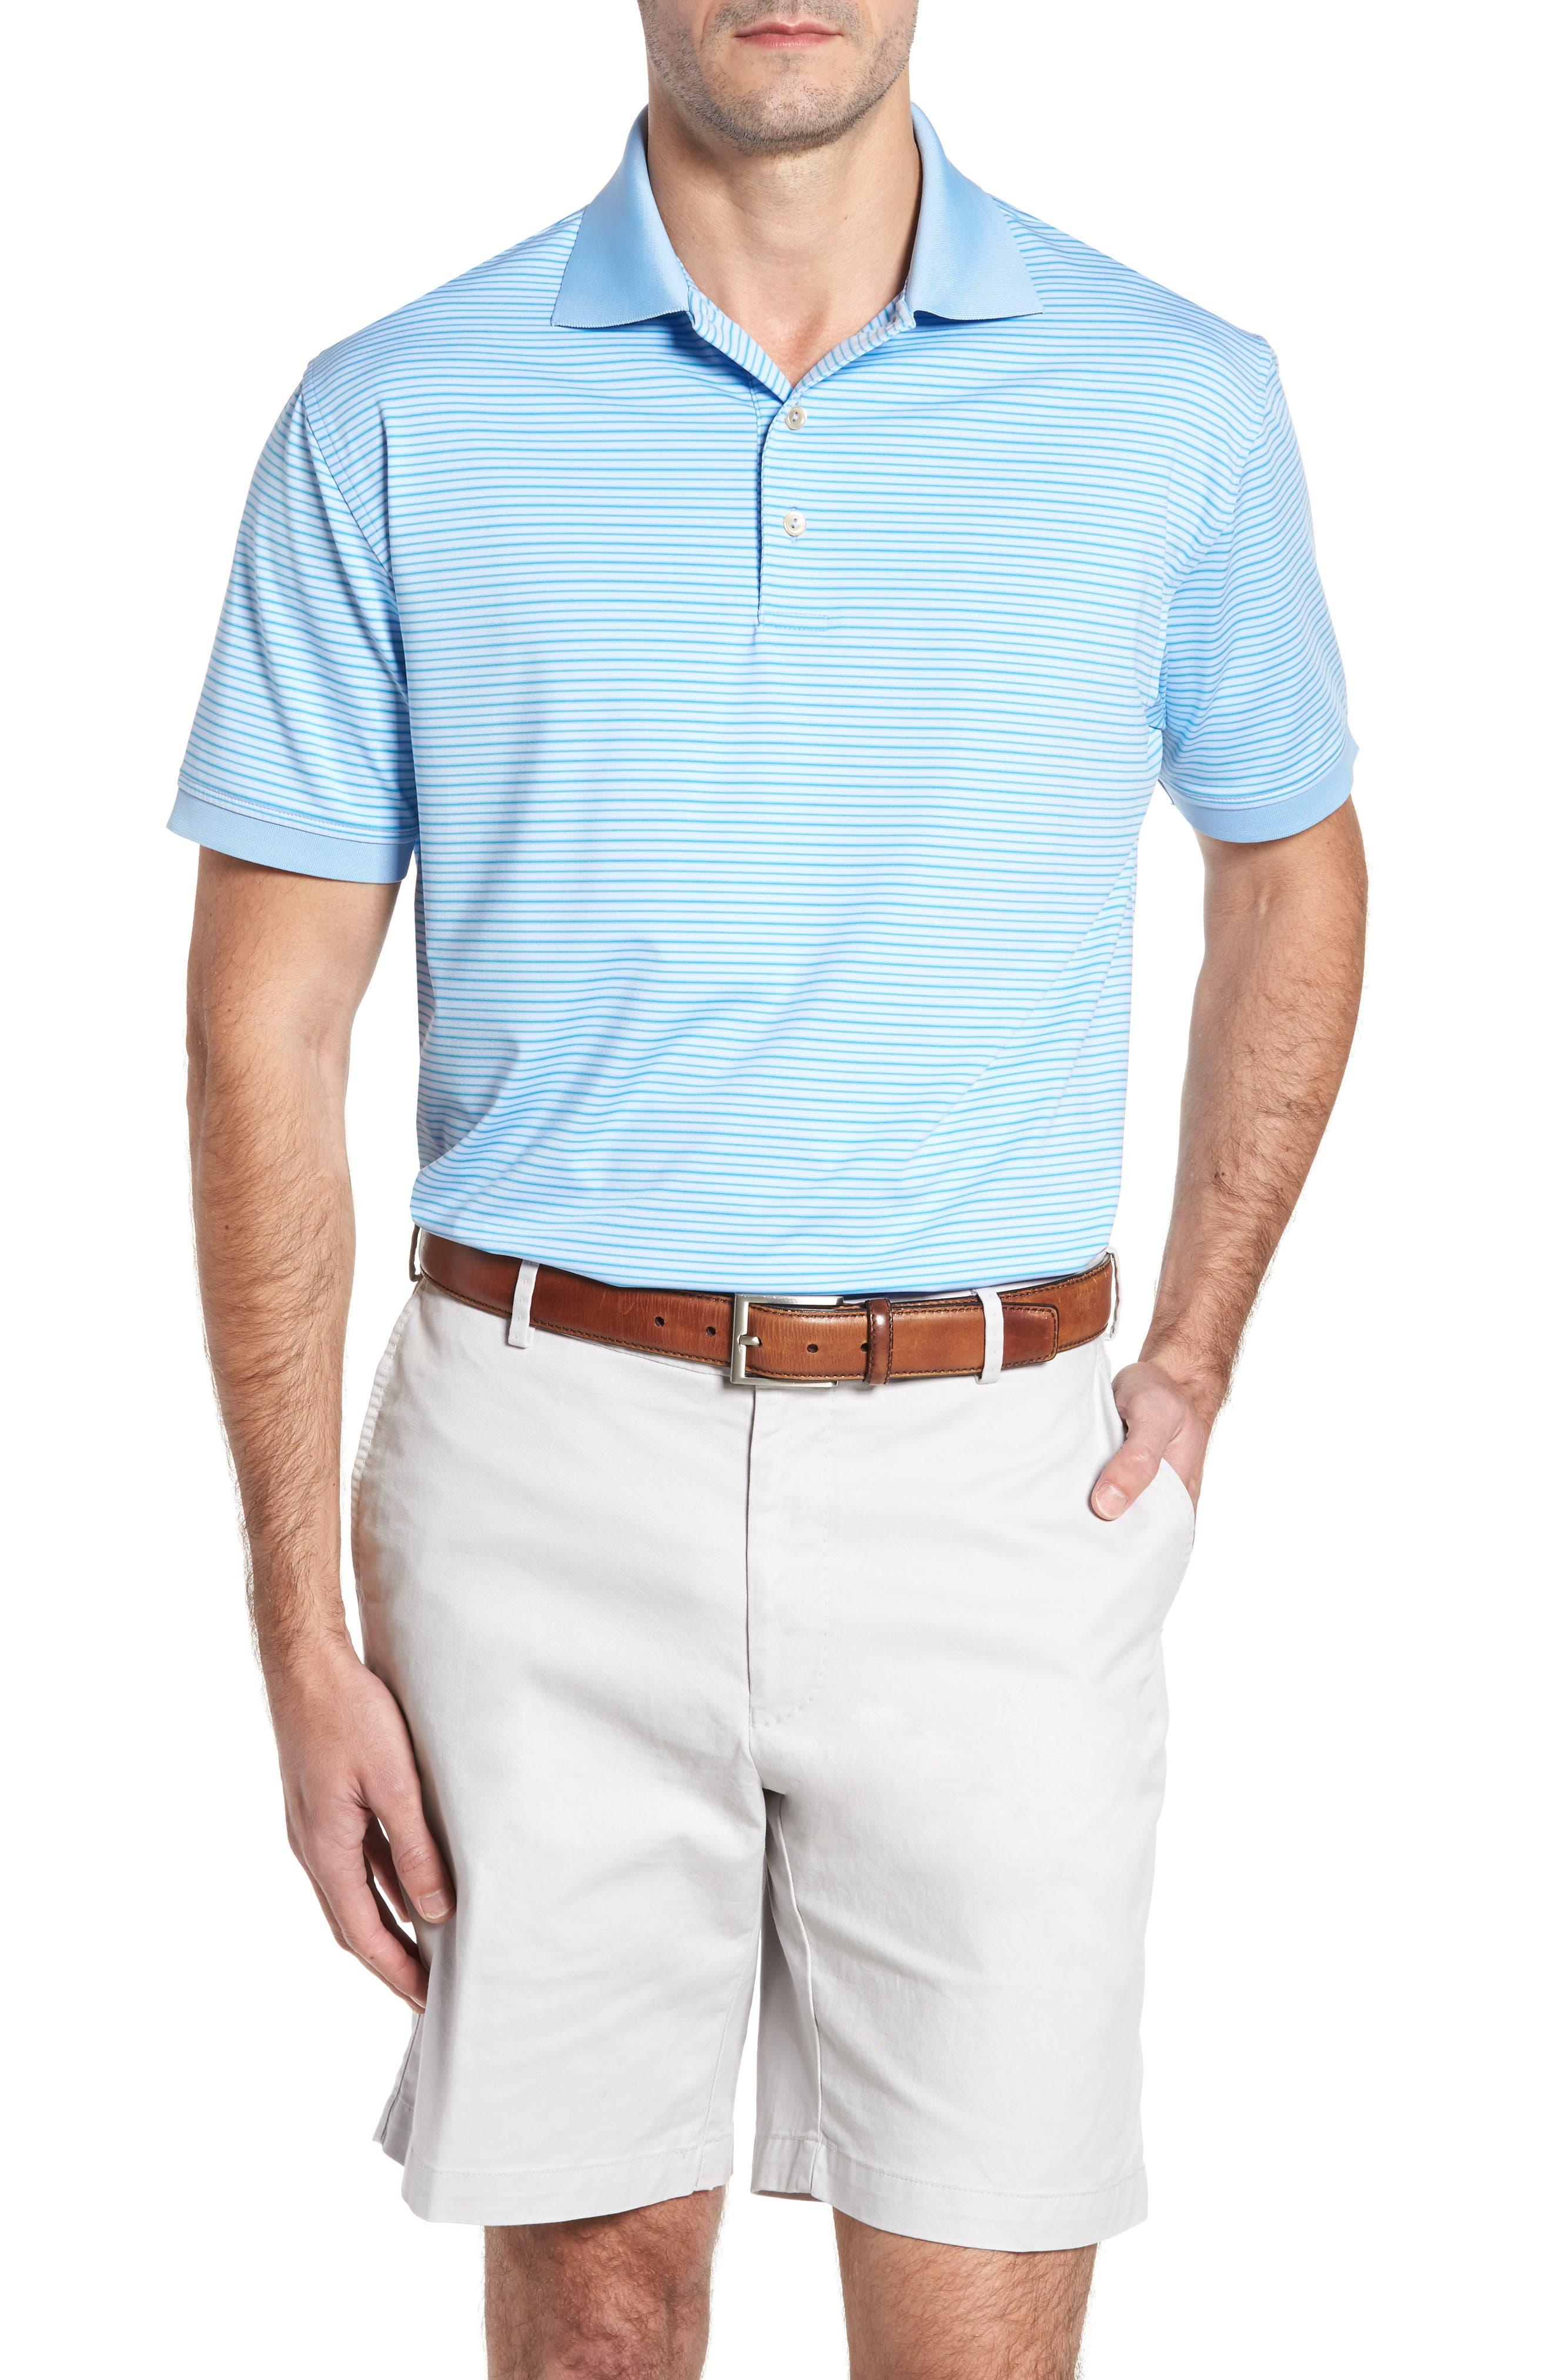 Peter Millar Creto Stripe Jersey Polo